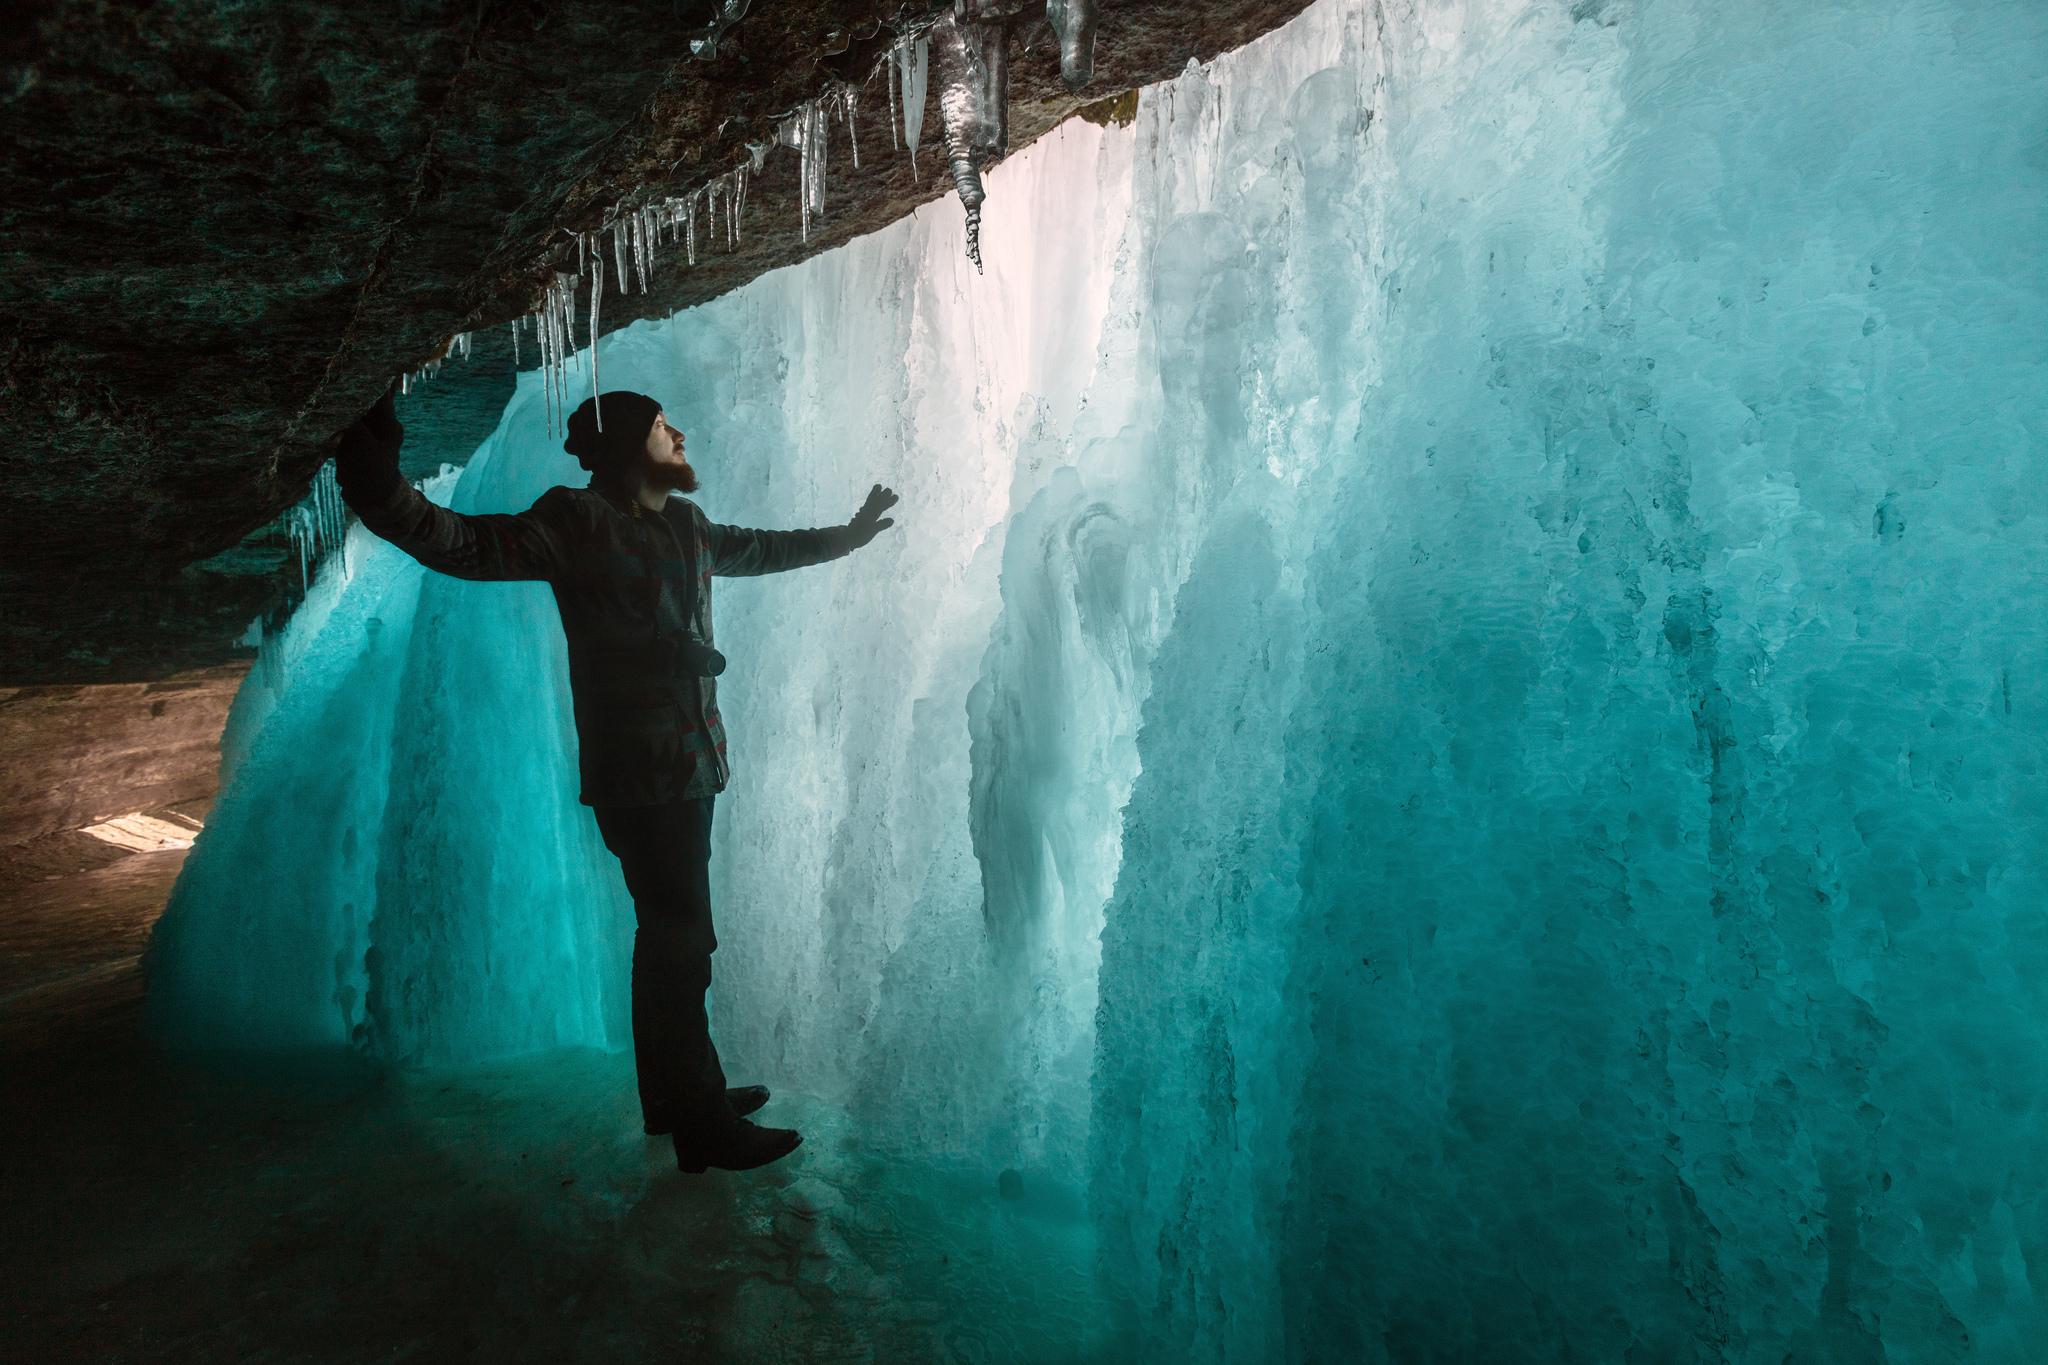 Exploring behind the falls. Minnehaha Falls frozen in winter, Minneapolis, Minnesota